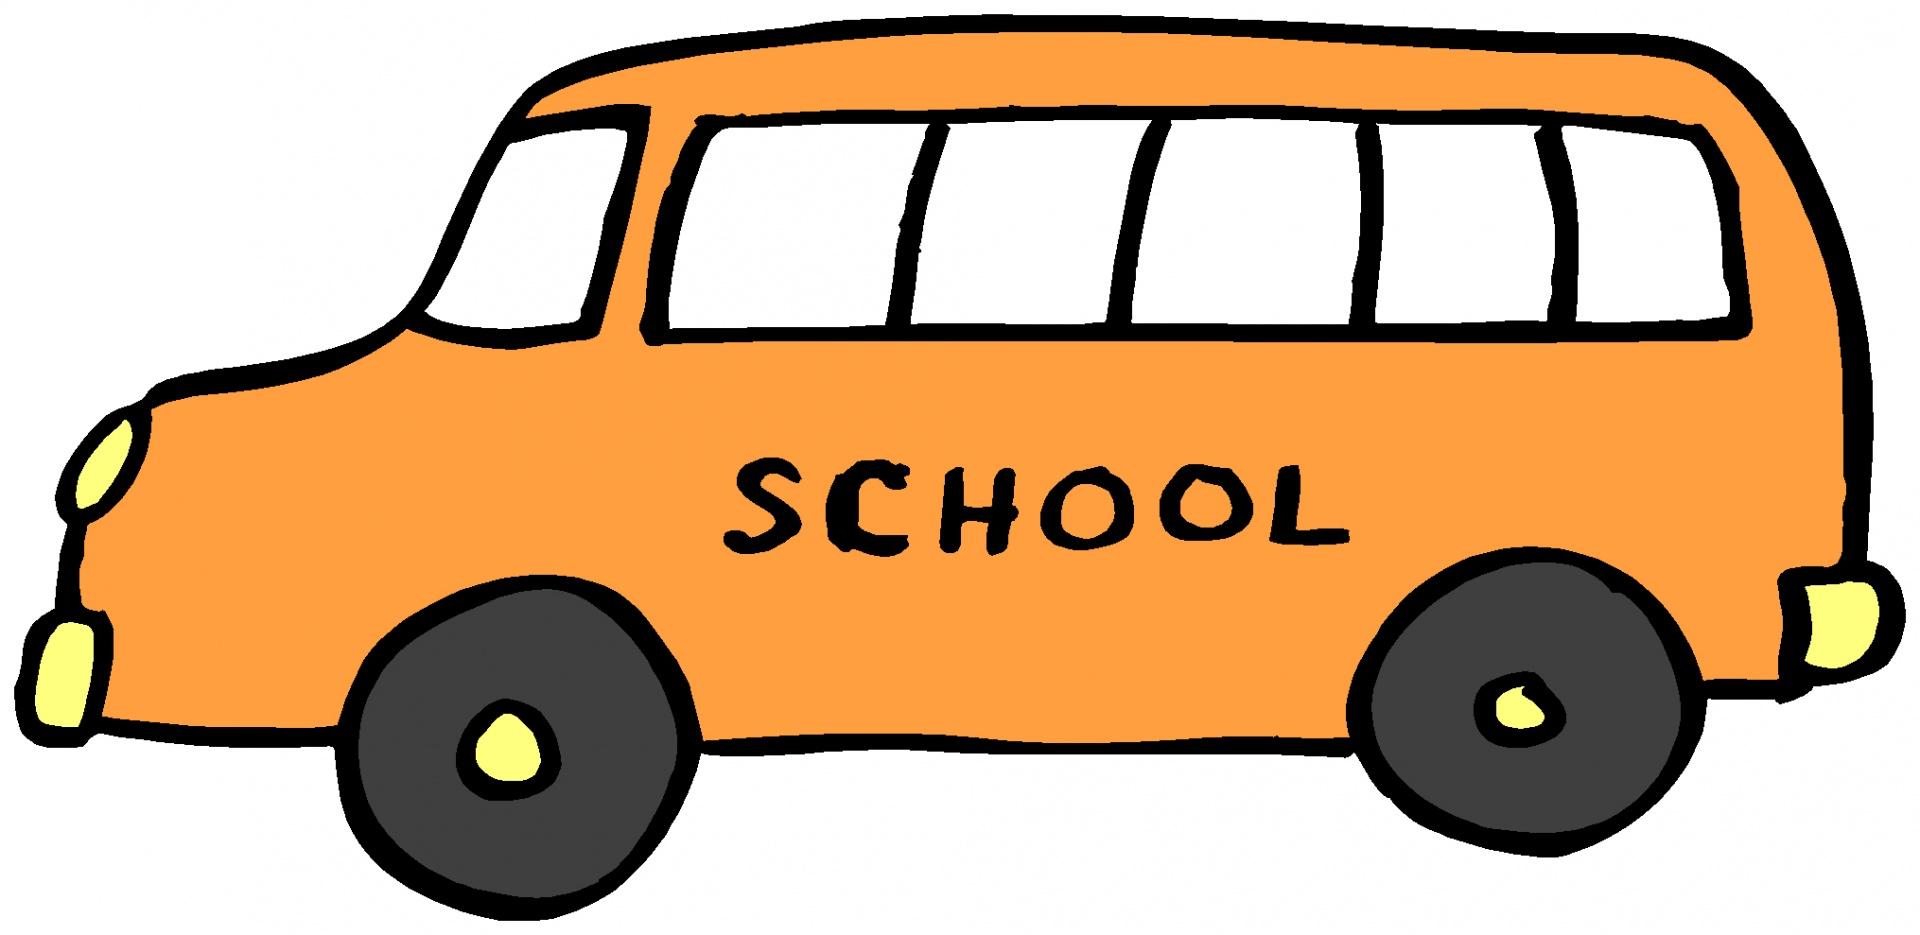 1920x935 School Bus Clip Art Black And White Image